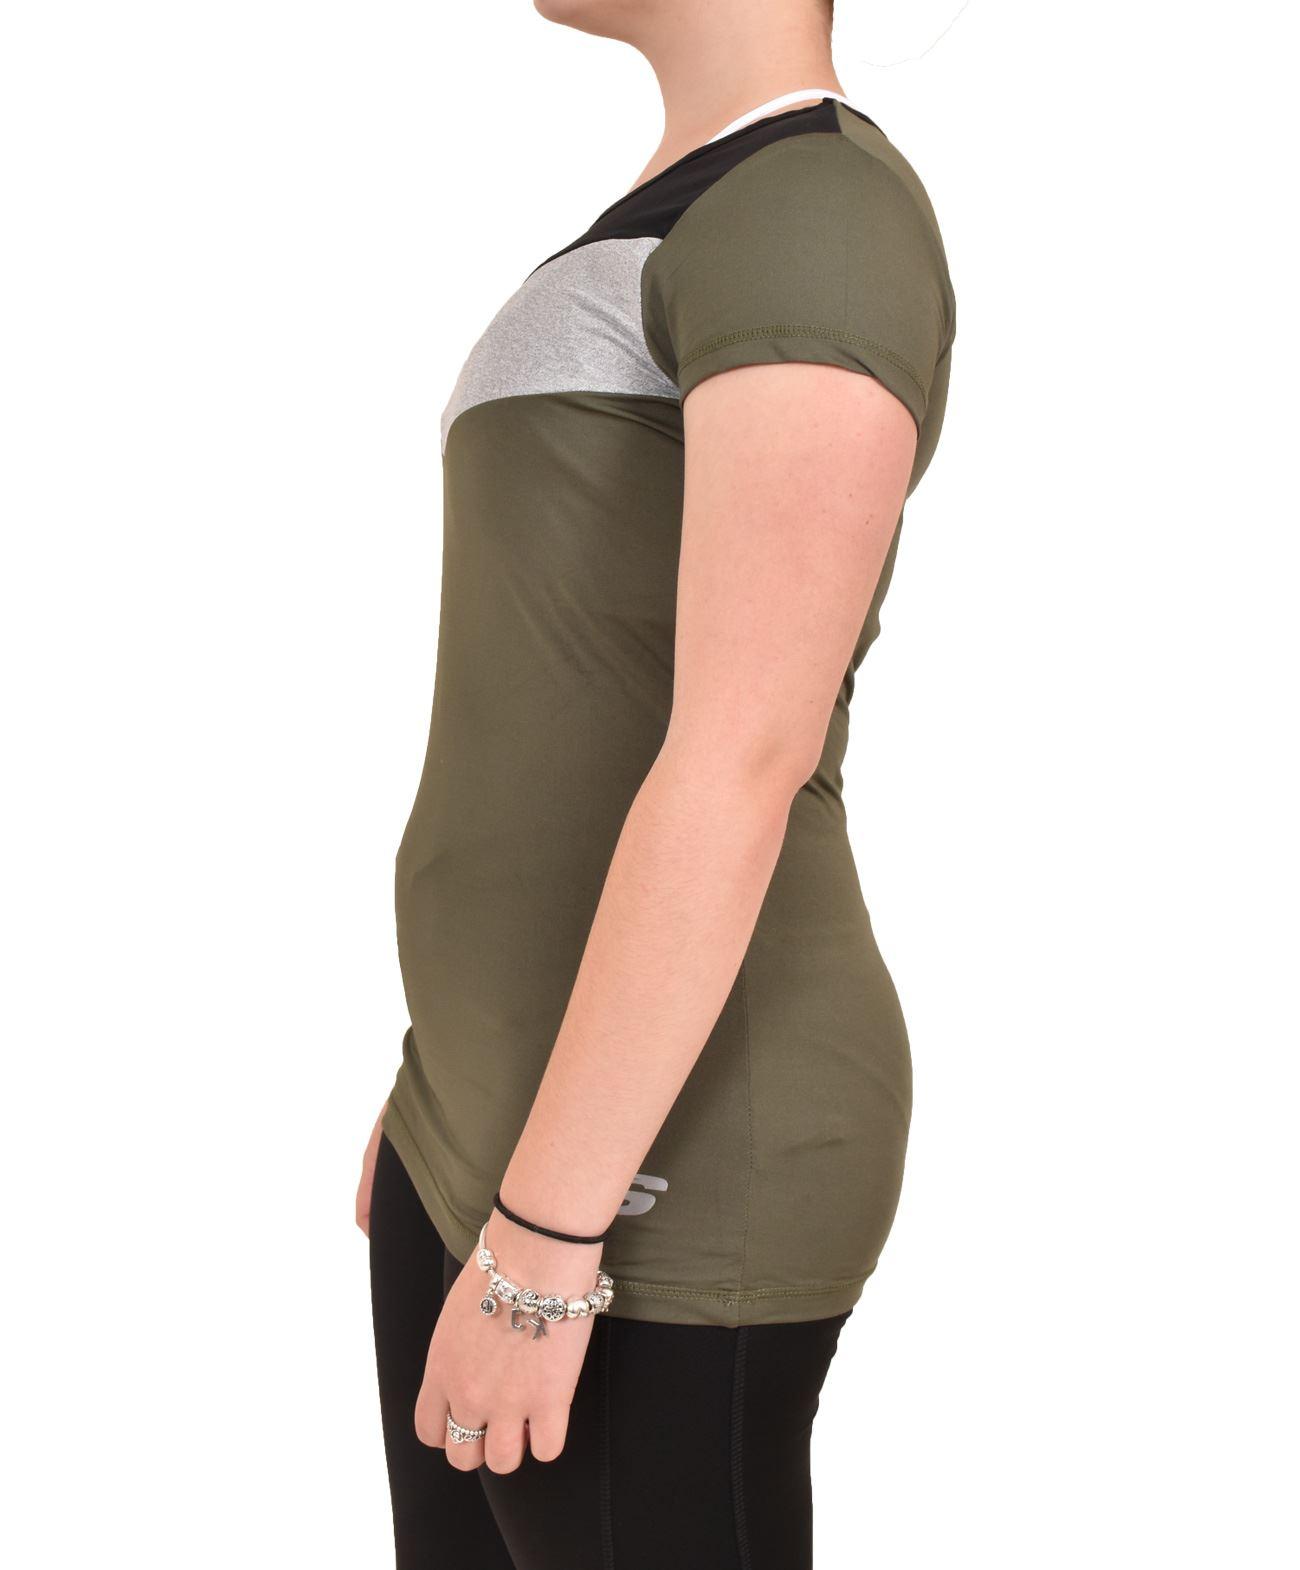 Camiseta-para-mujer-Skechers-Secado-Rapido-Top-senoras-de-Deportes-Activewear-Gimnasio-Fitness-Dance miniatura 11